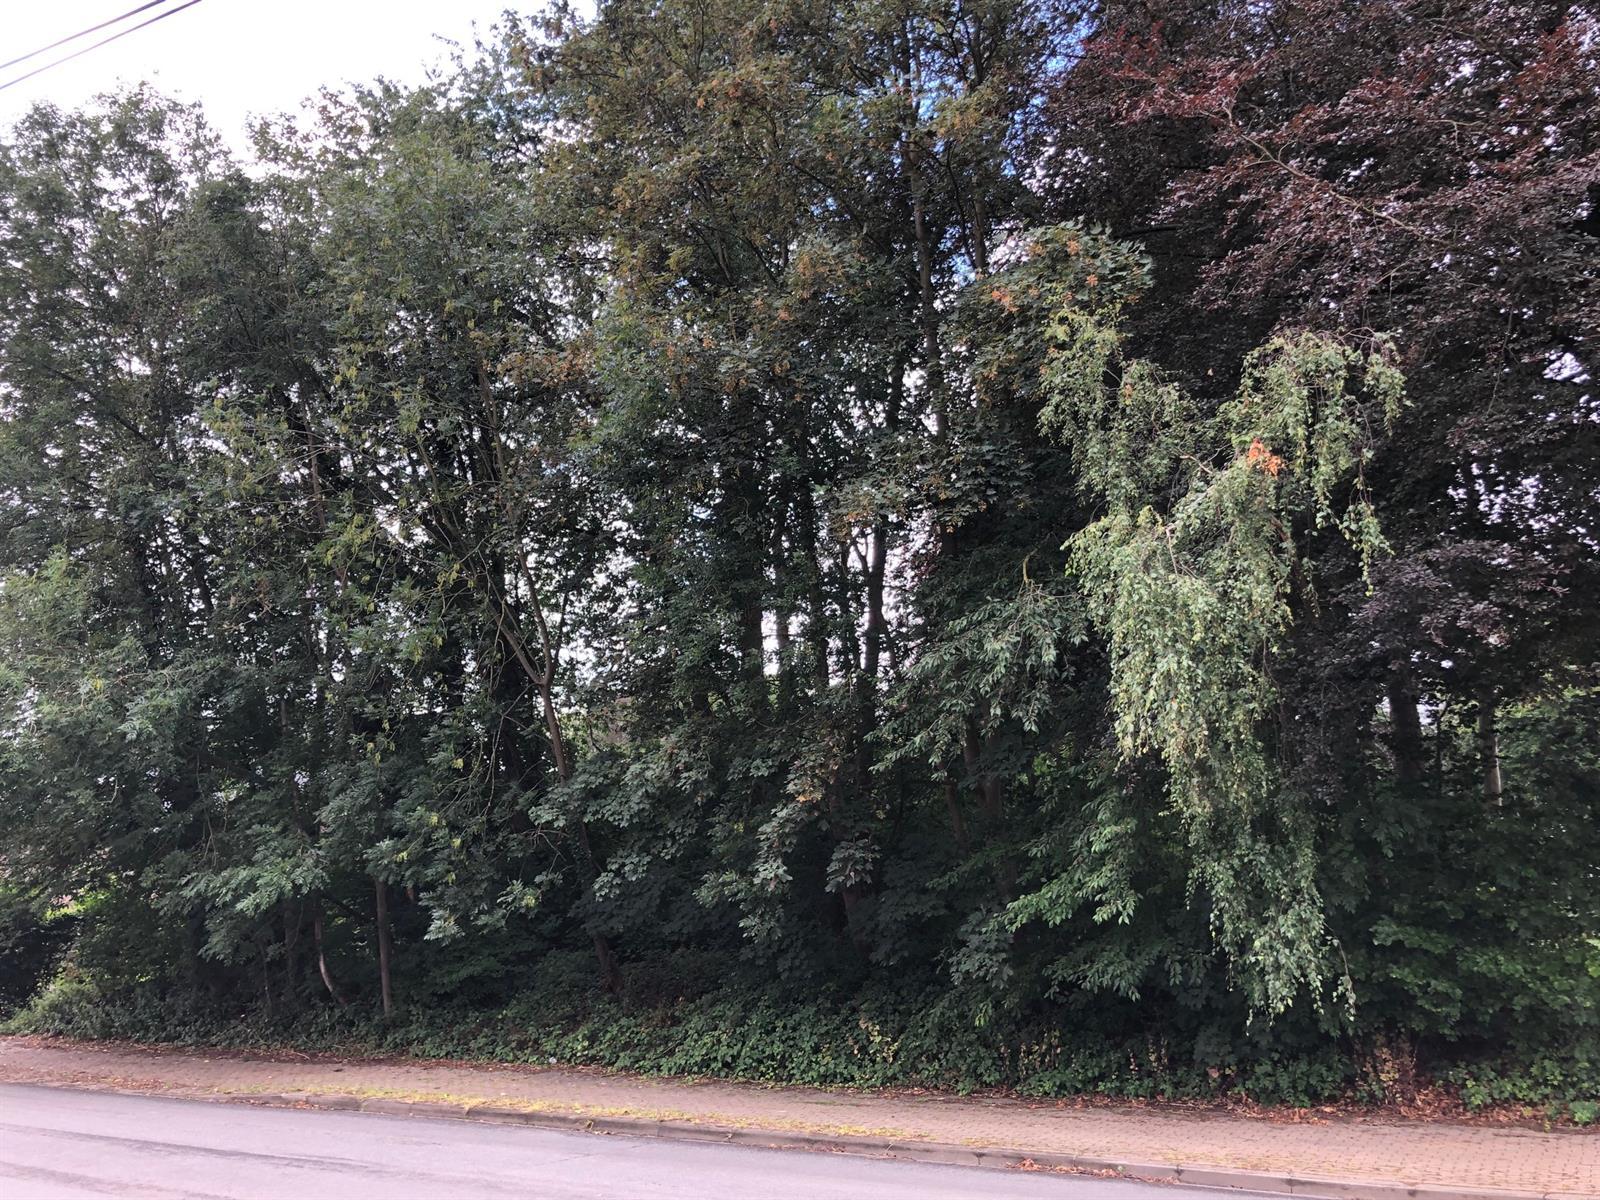 Terrain à bâtir - Ottignies-Louvain-la-Neuve - #4092046-3